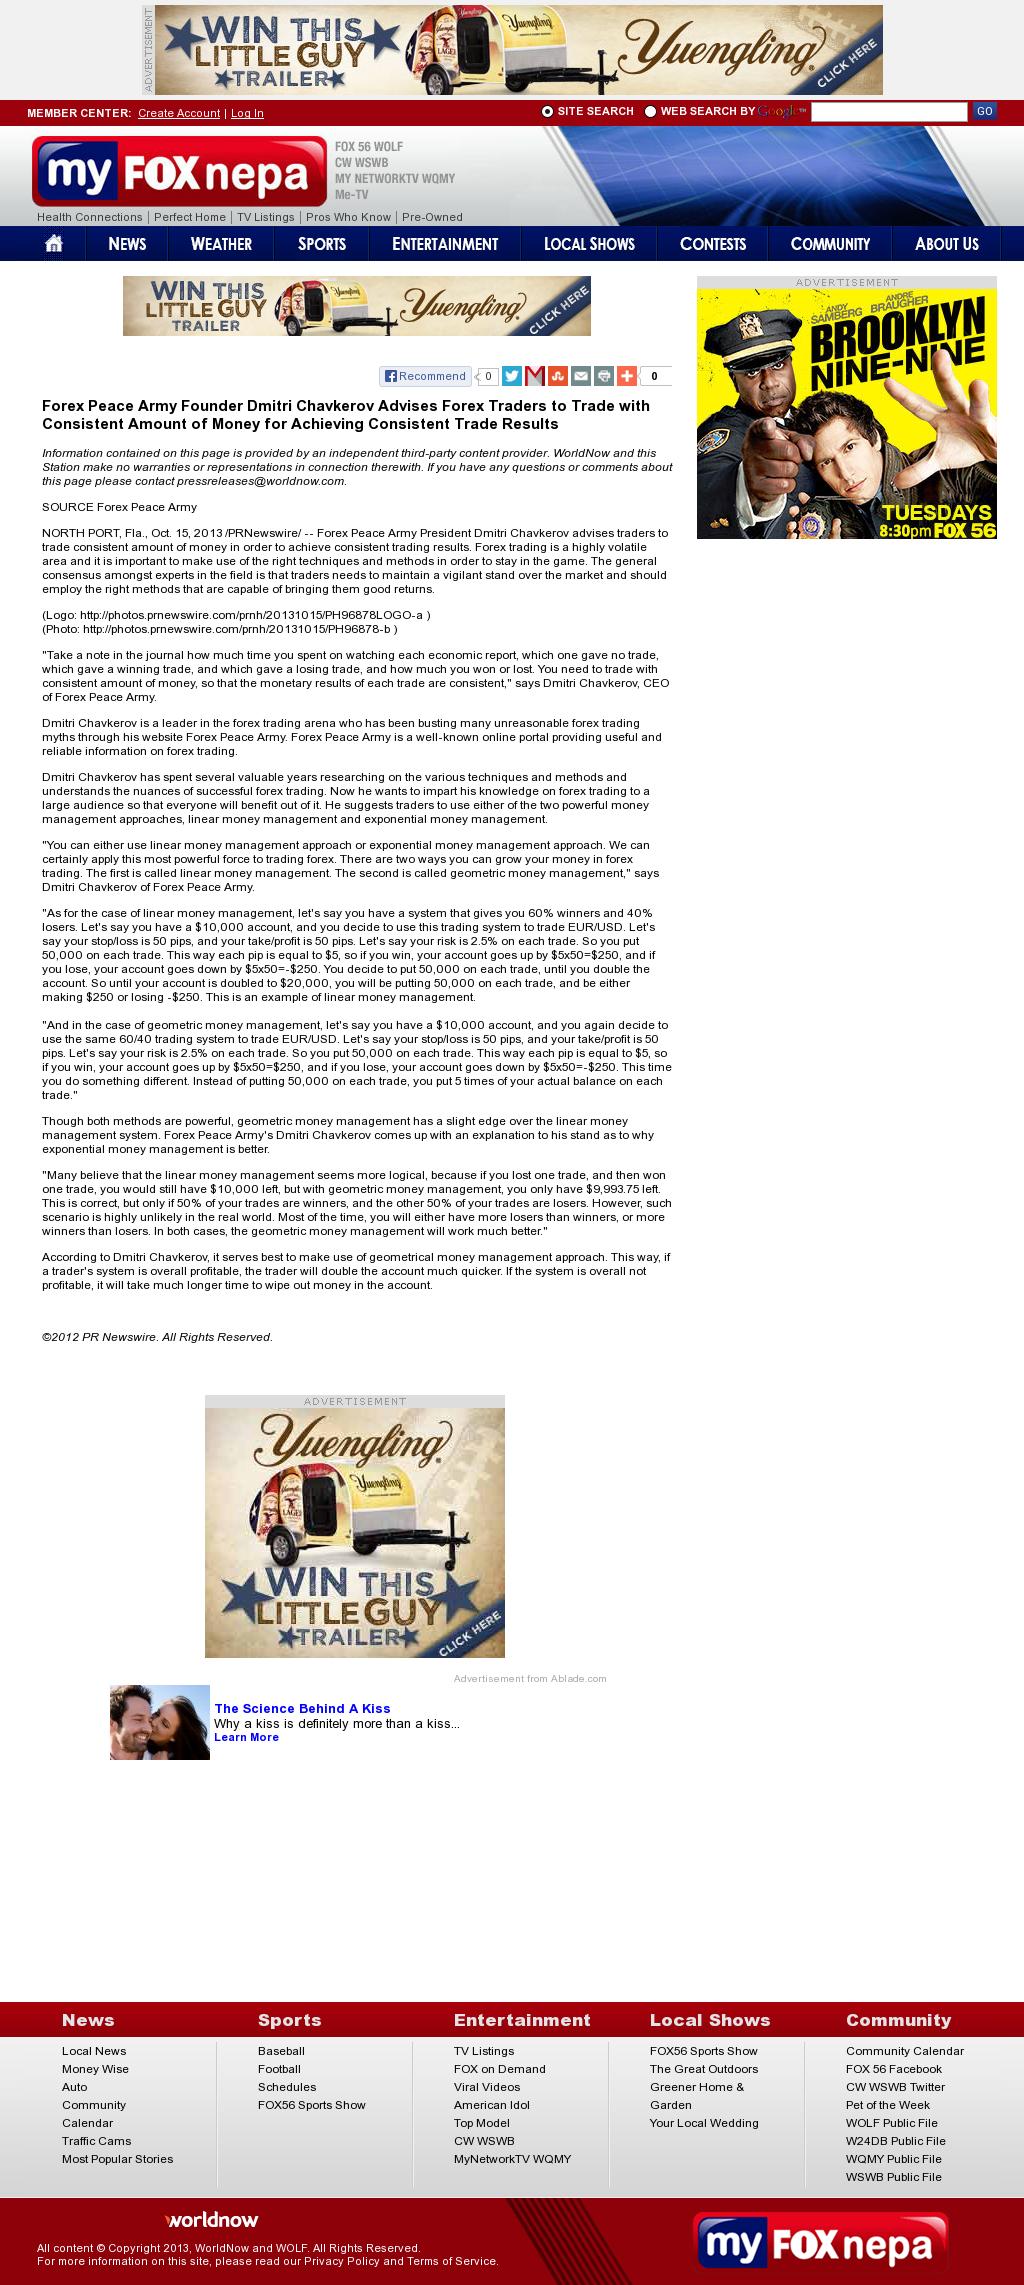 Dmitri Chavkerov - WOLF-TV FOX-56 (Wilkes-Barre, PA) - Consistent Money